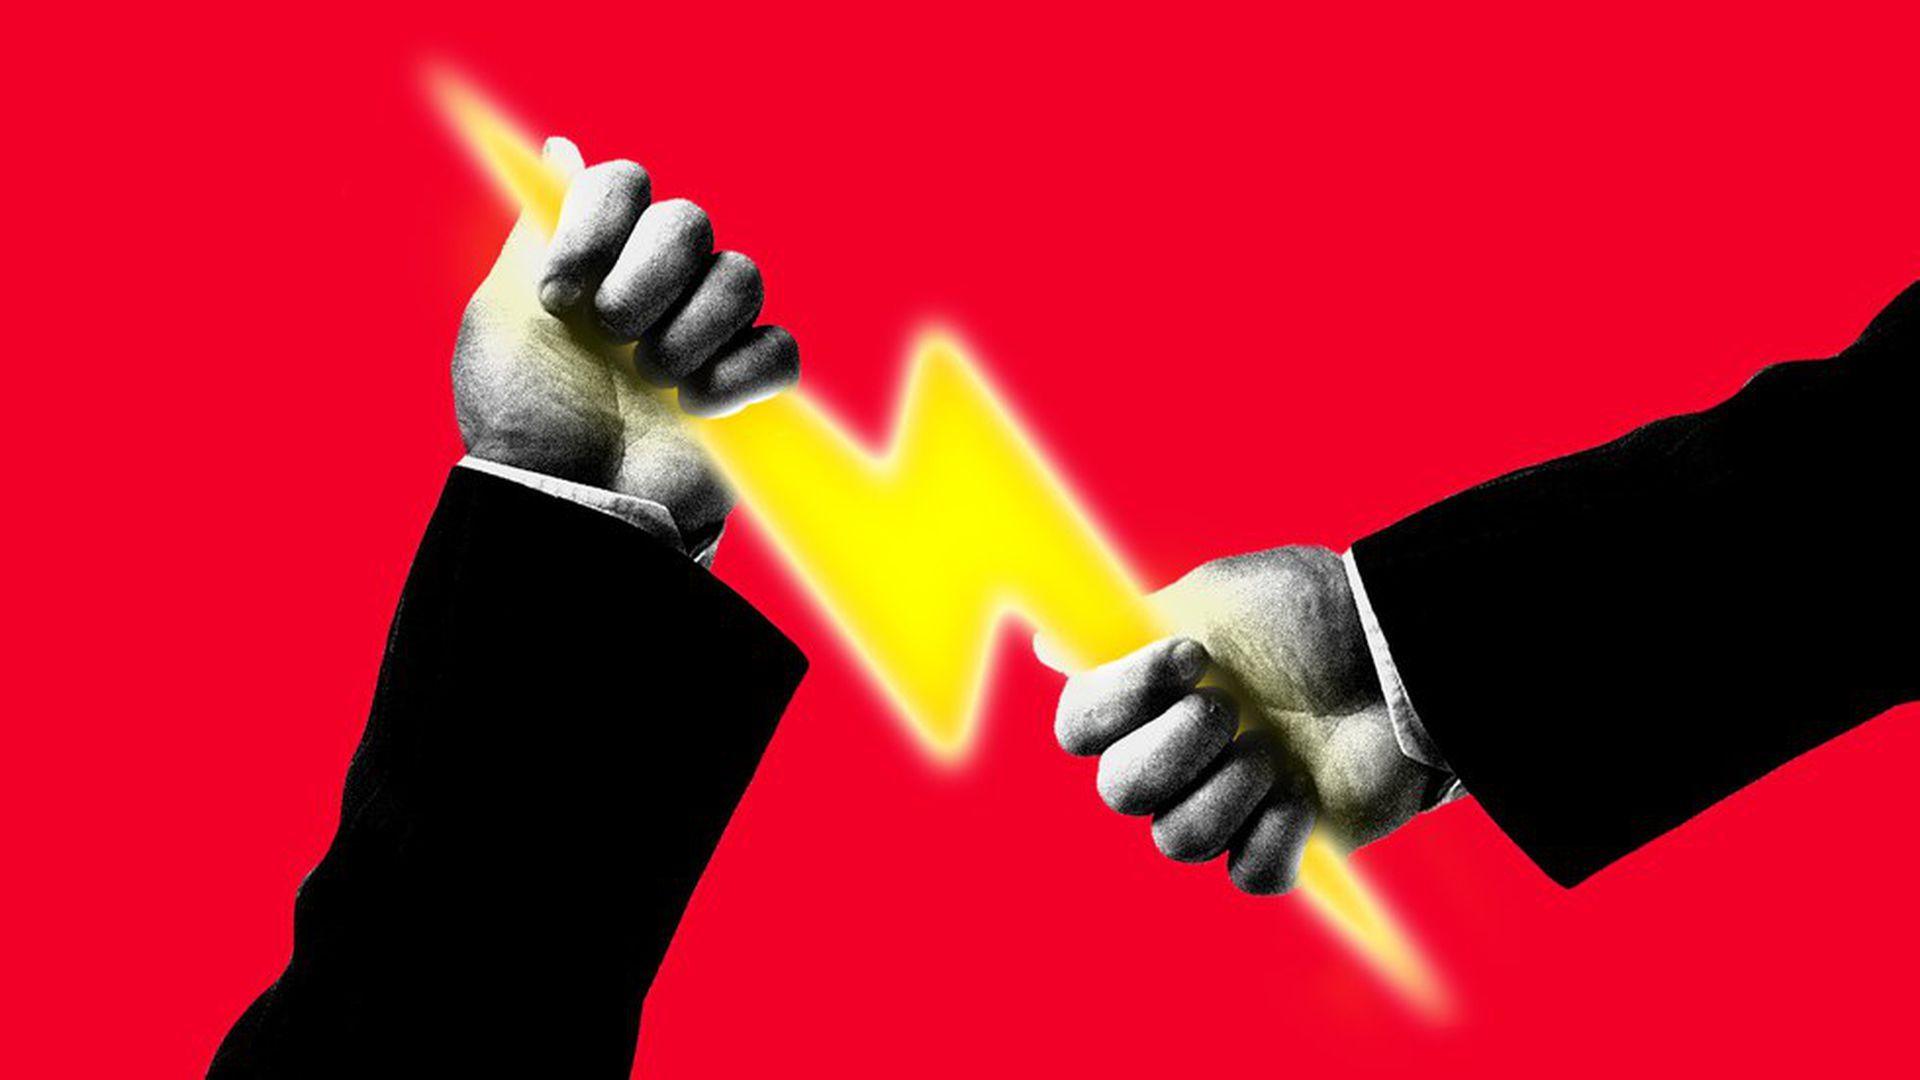 Illustration of hands holding a lightning bolt